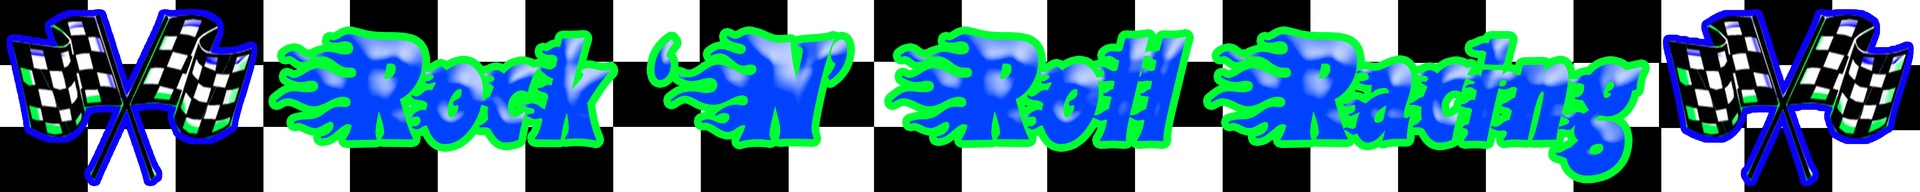 Custom Rock N Roll Racing logo